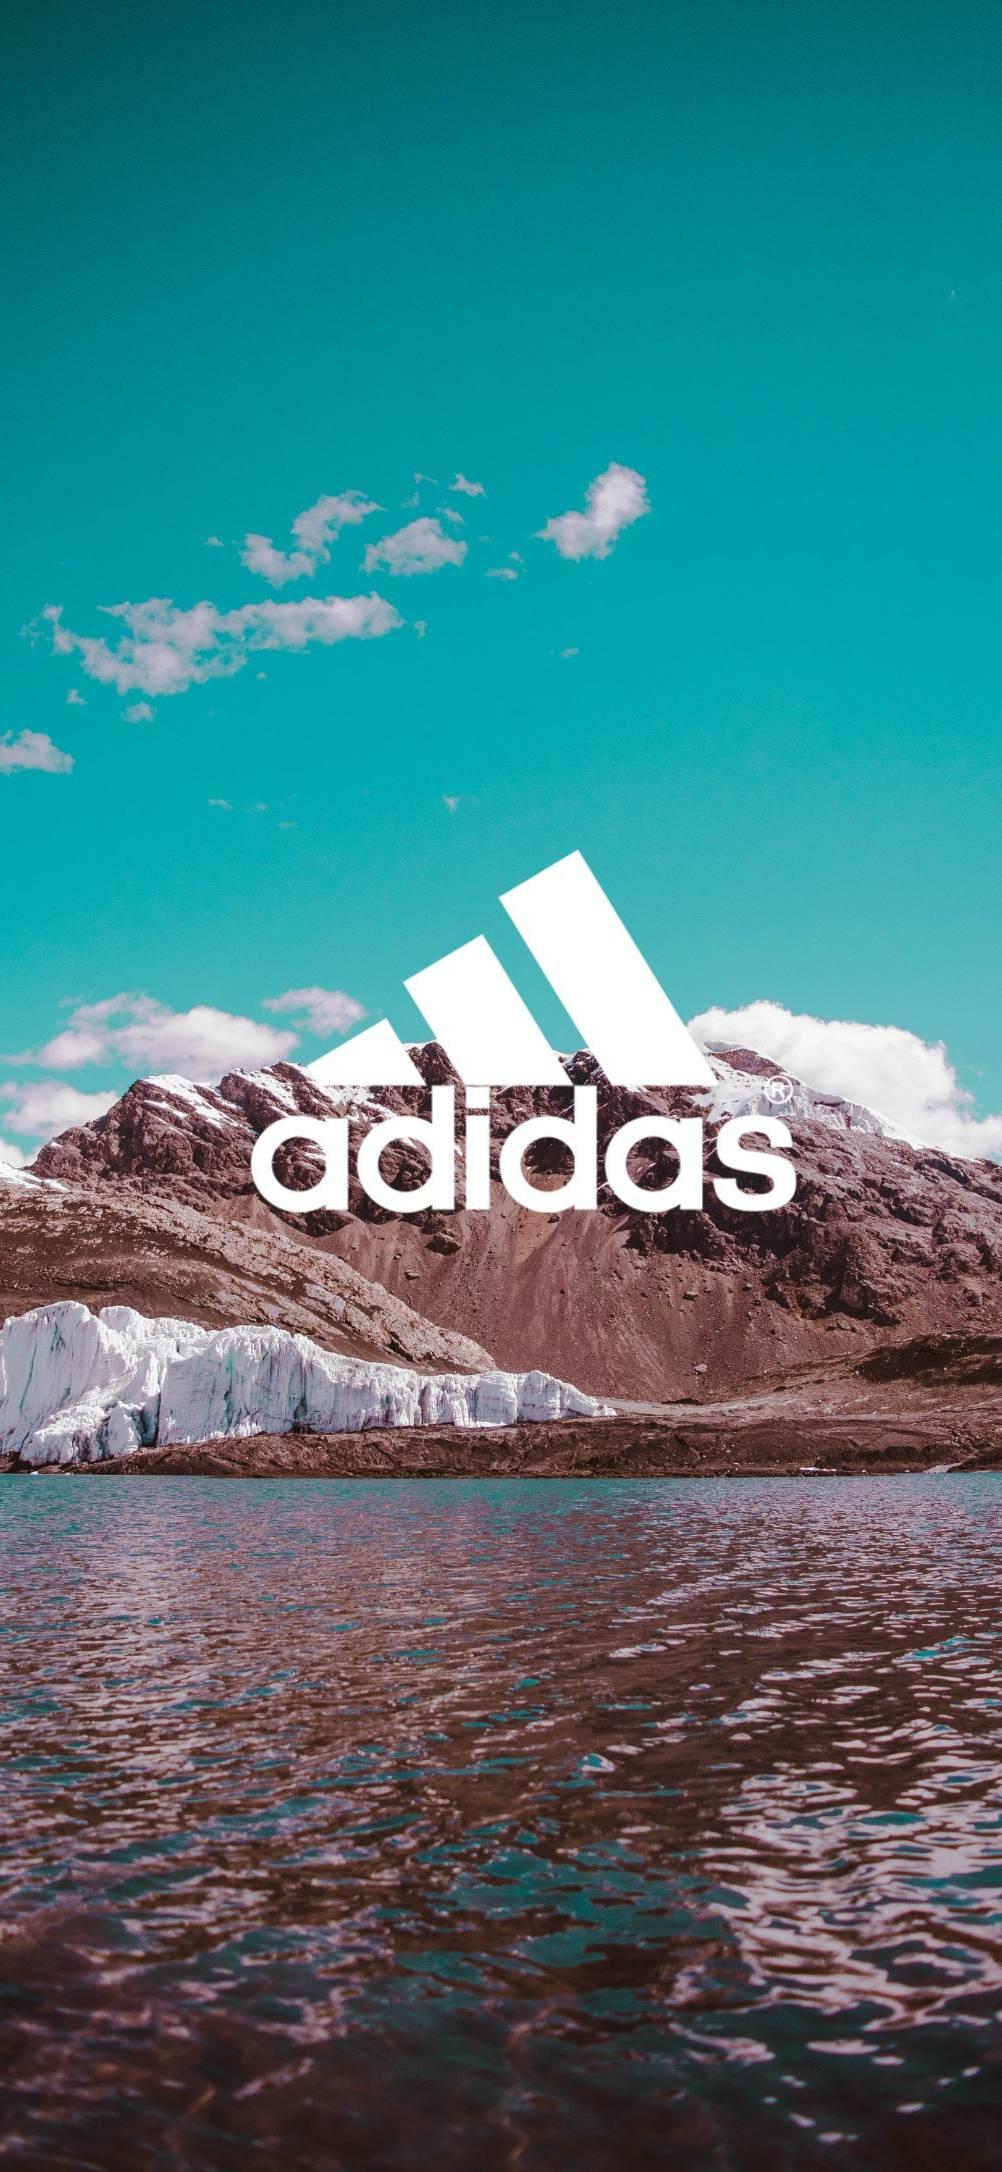 Adidas Lockscreen Wallpapers - Whats App Dp Nature , HD Wallpaper & Backgrounds